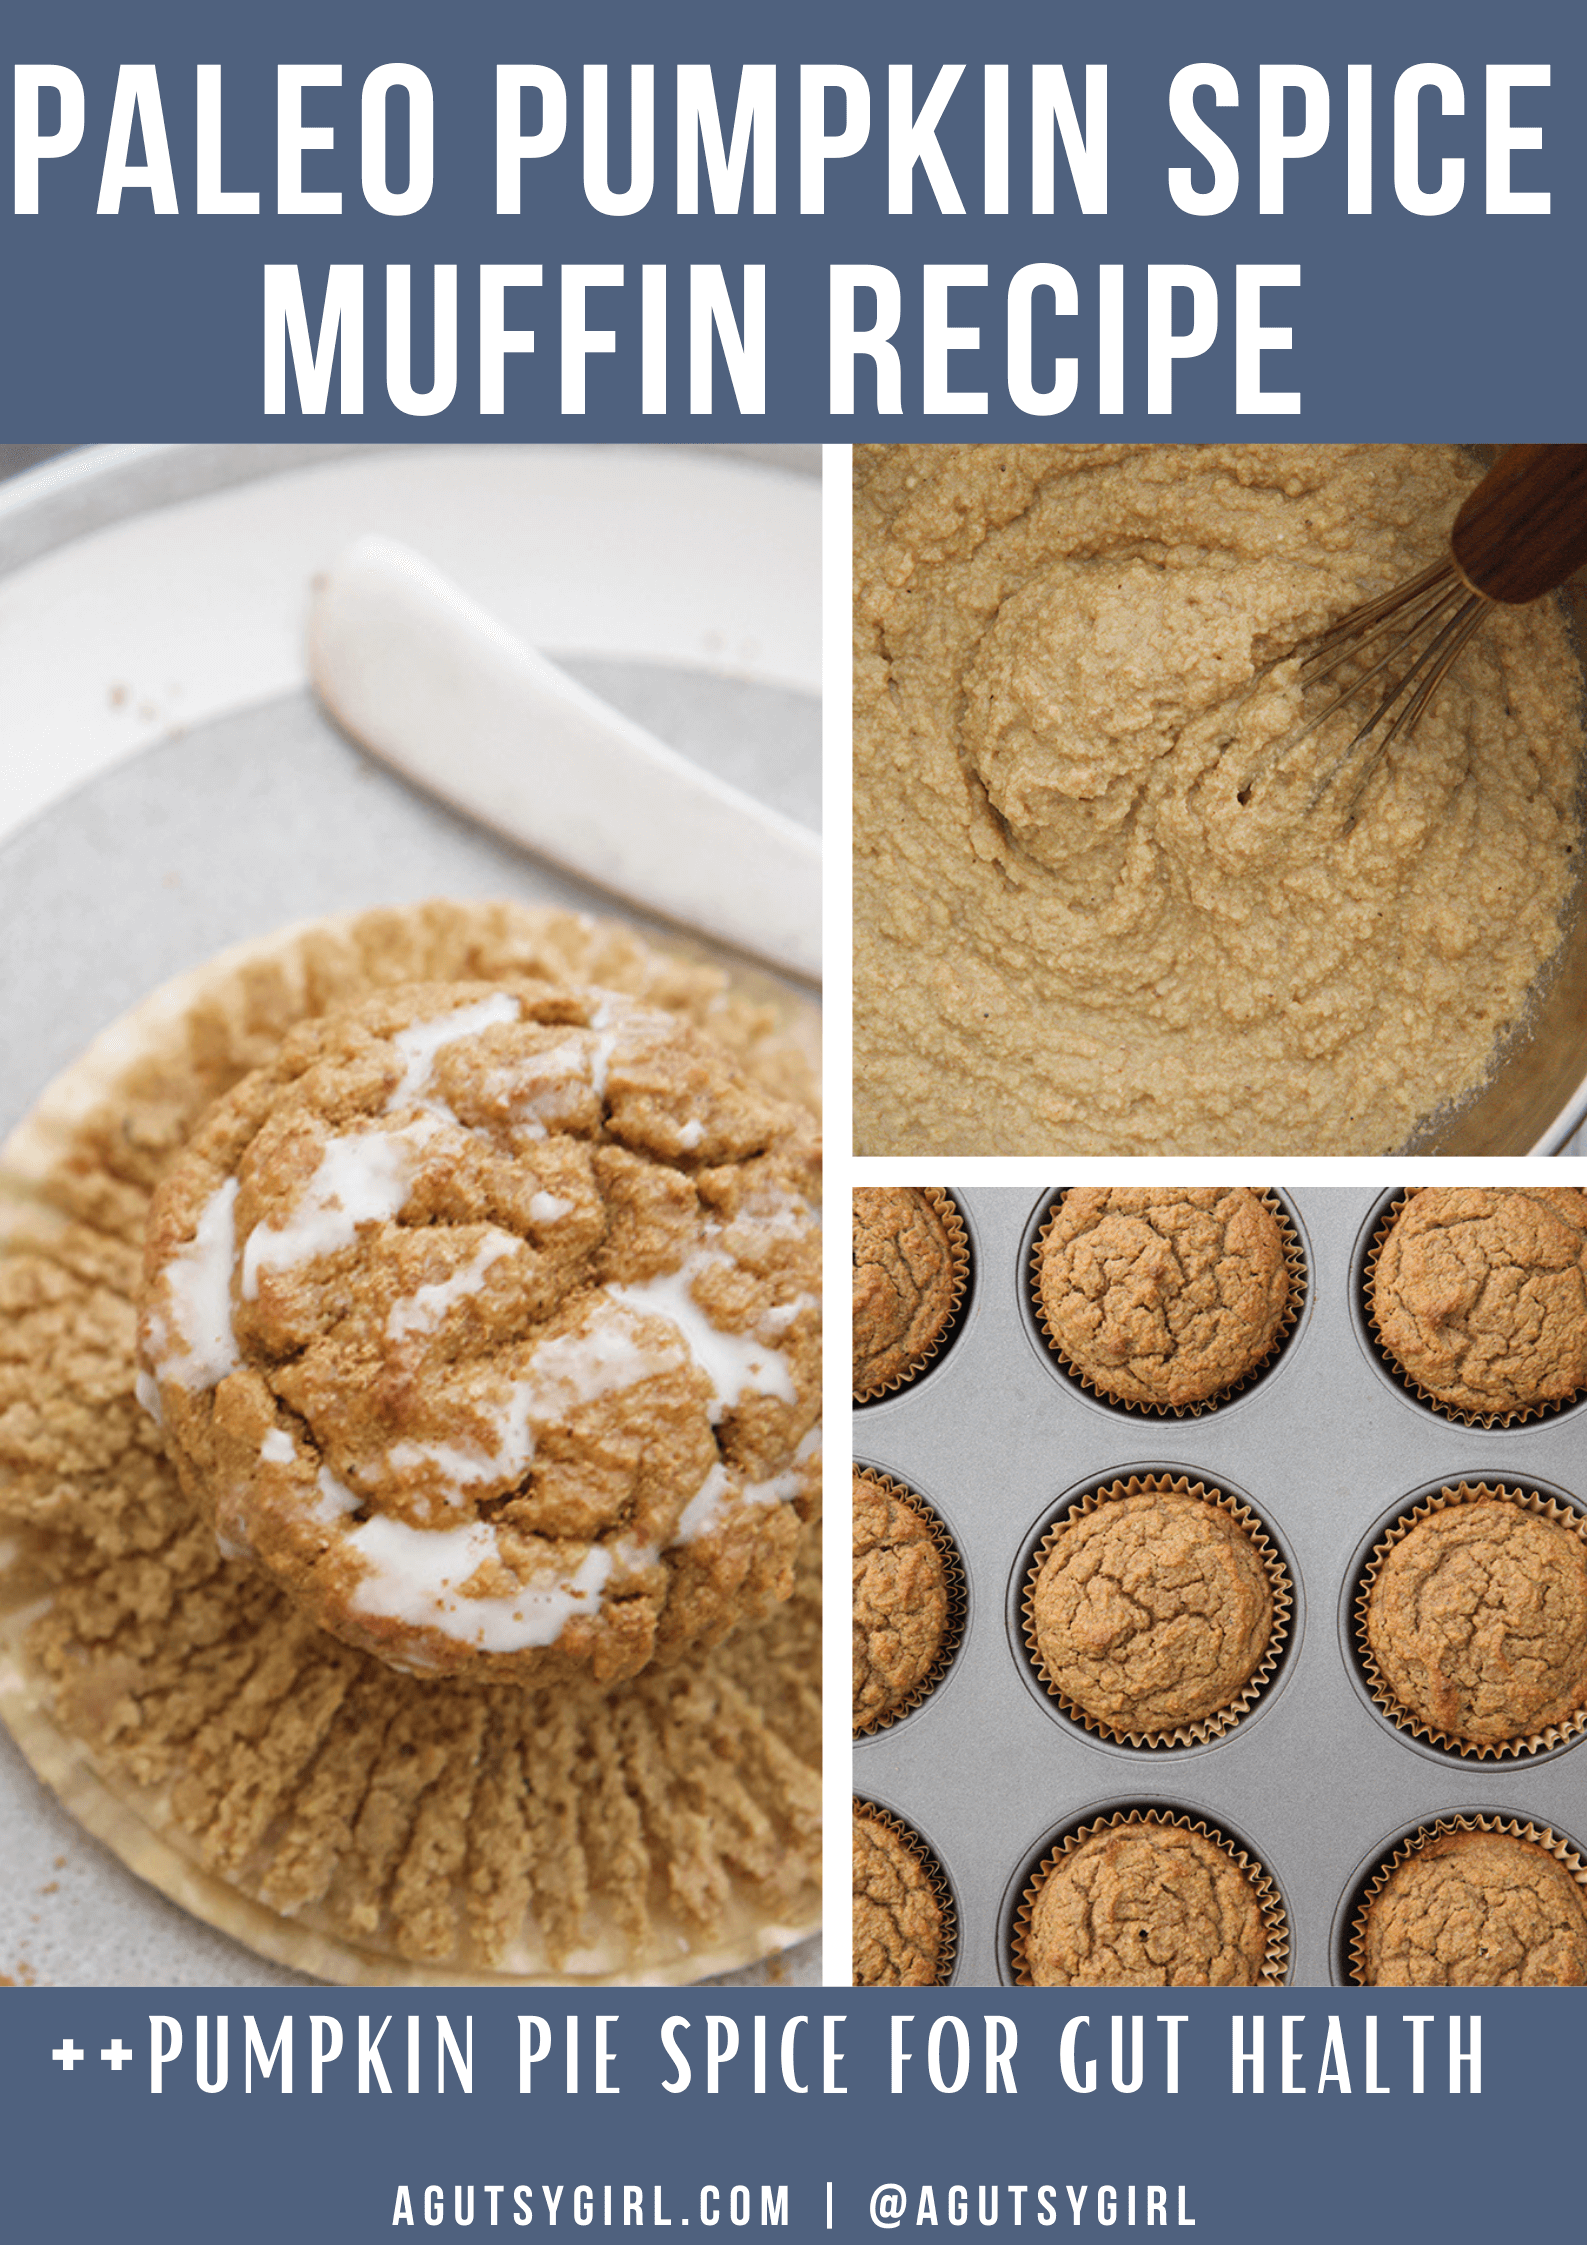 Paleo Pumpkin Spice Muffin Recipe agutsygirl.com #pumpkinpie #pumpkinspice #guthealth #healingspices #spices